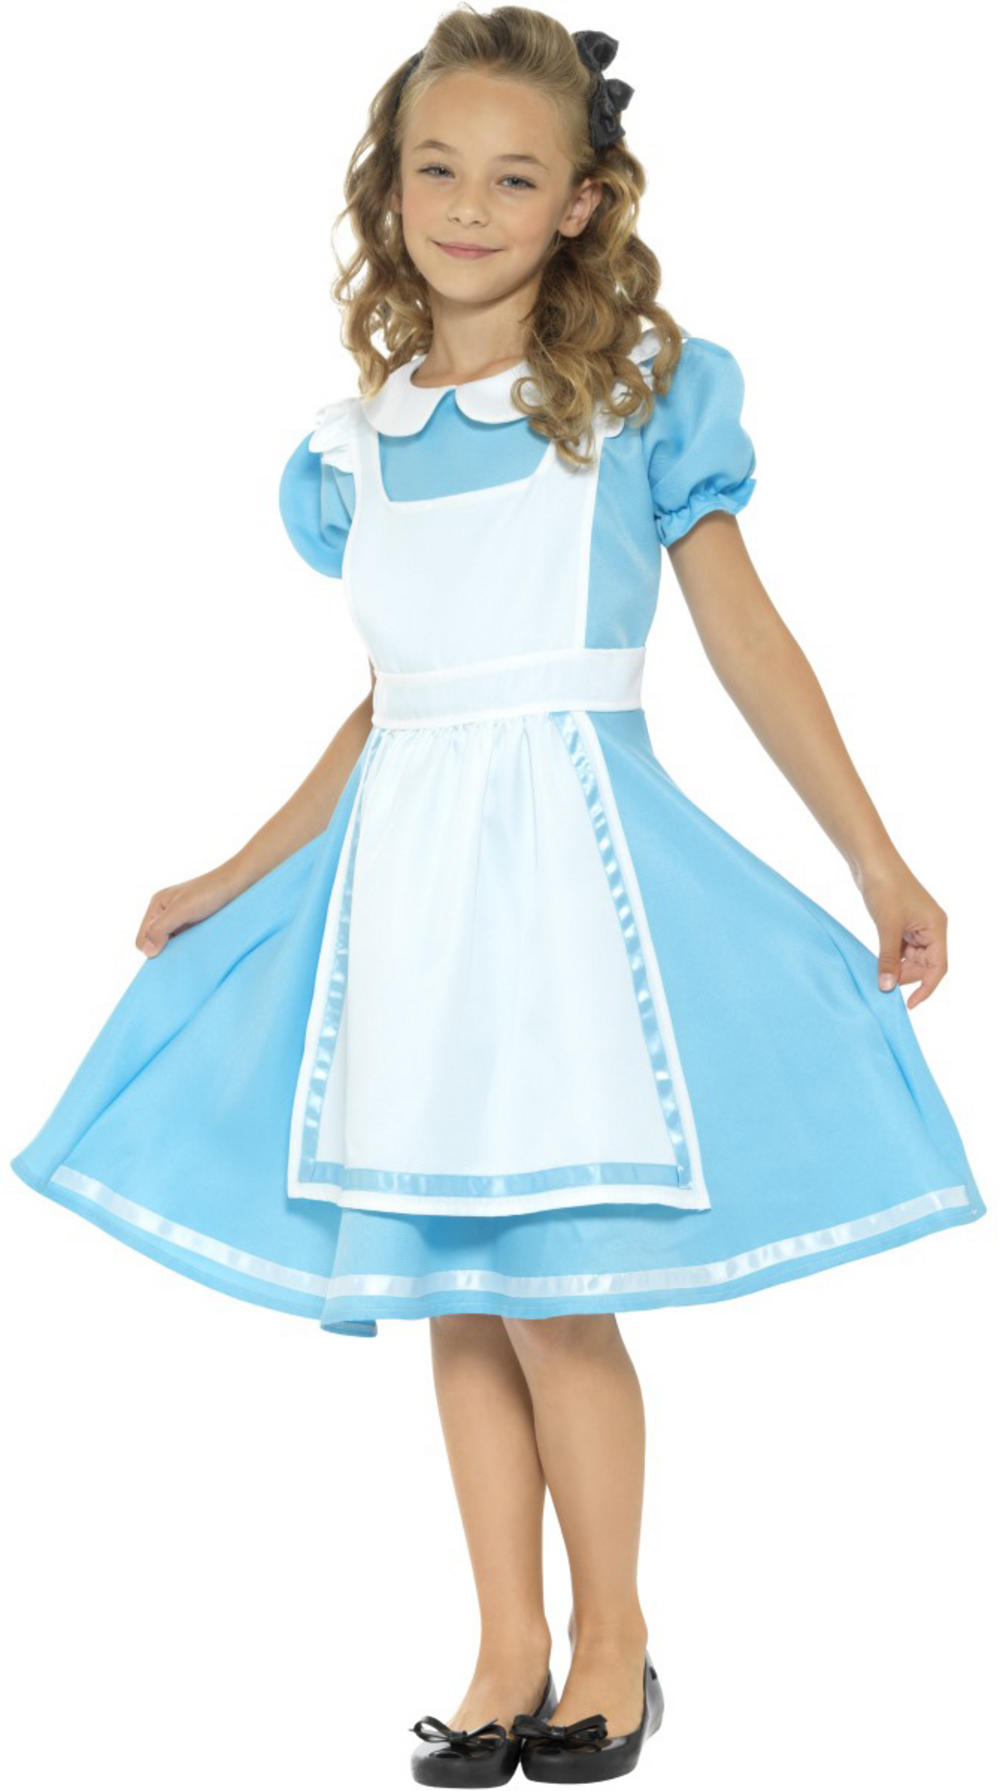 Wonderland Princess Girls Costume